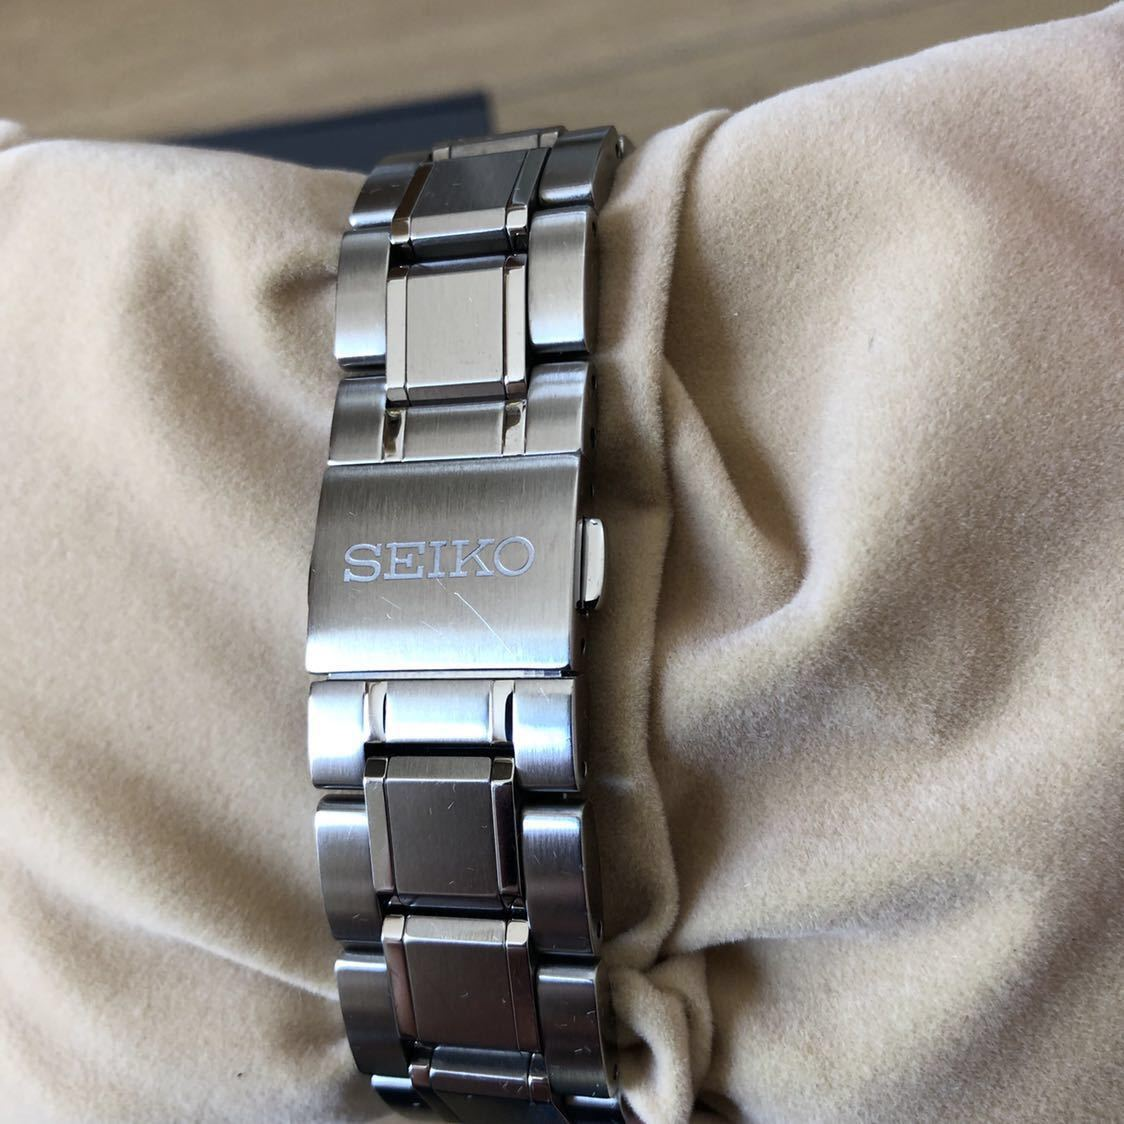 SEIKO PRESAGE SARX035 セイコー プレザージュ 機械式 メカニカル 腕時計 自動巻_画像8